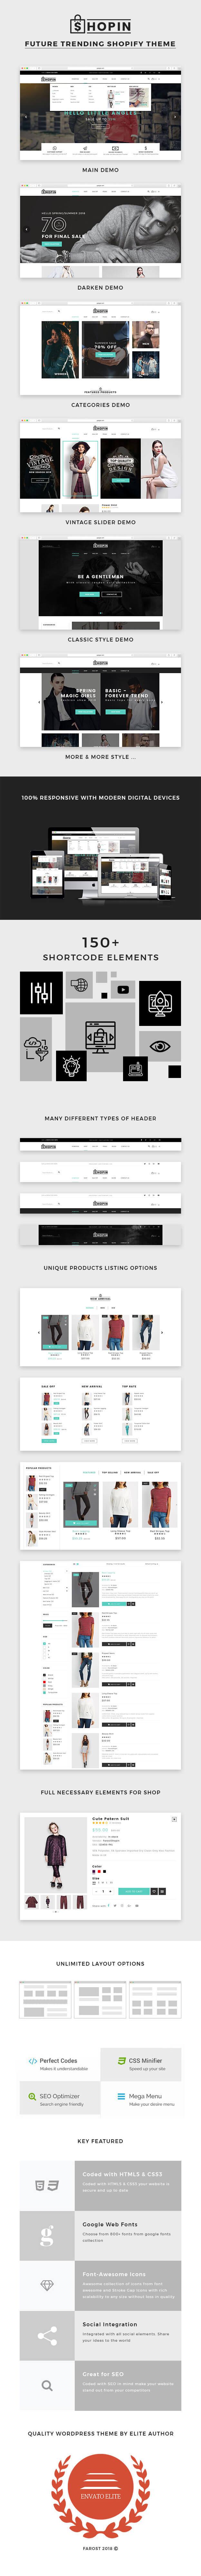 Shopin - Mutilpurpose eCommerce Shopify Theme